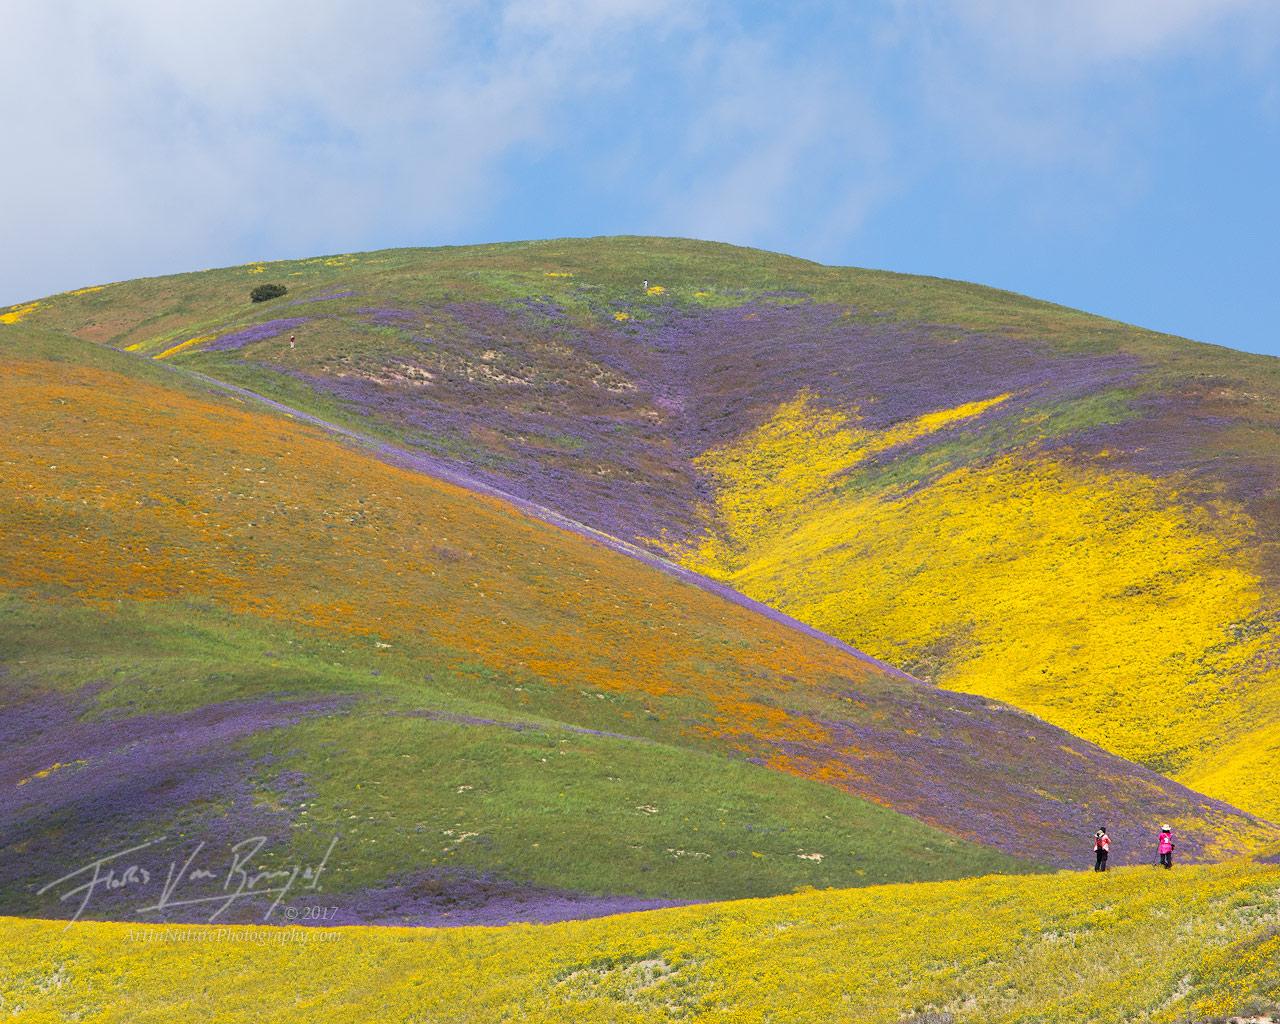 Carrizo Plains, Superbloom, Flowers, photo